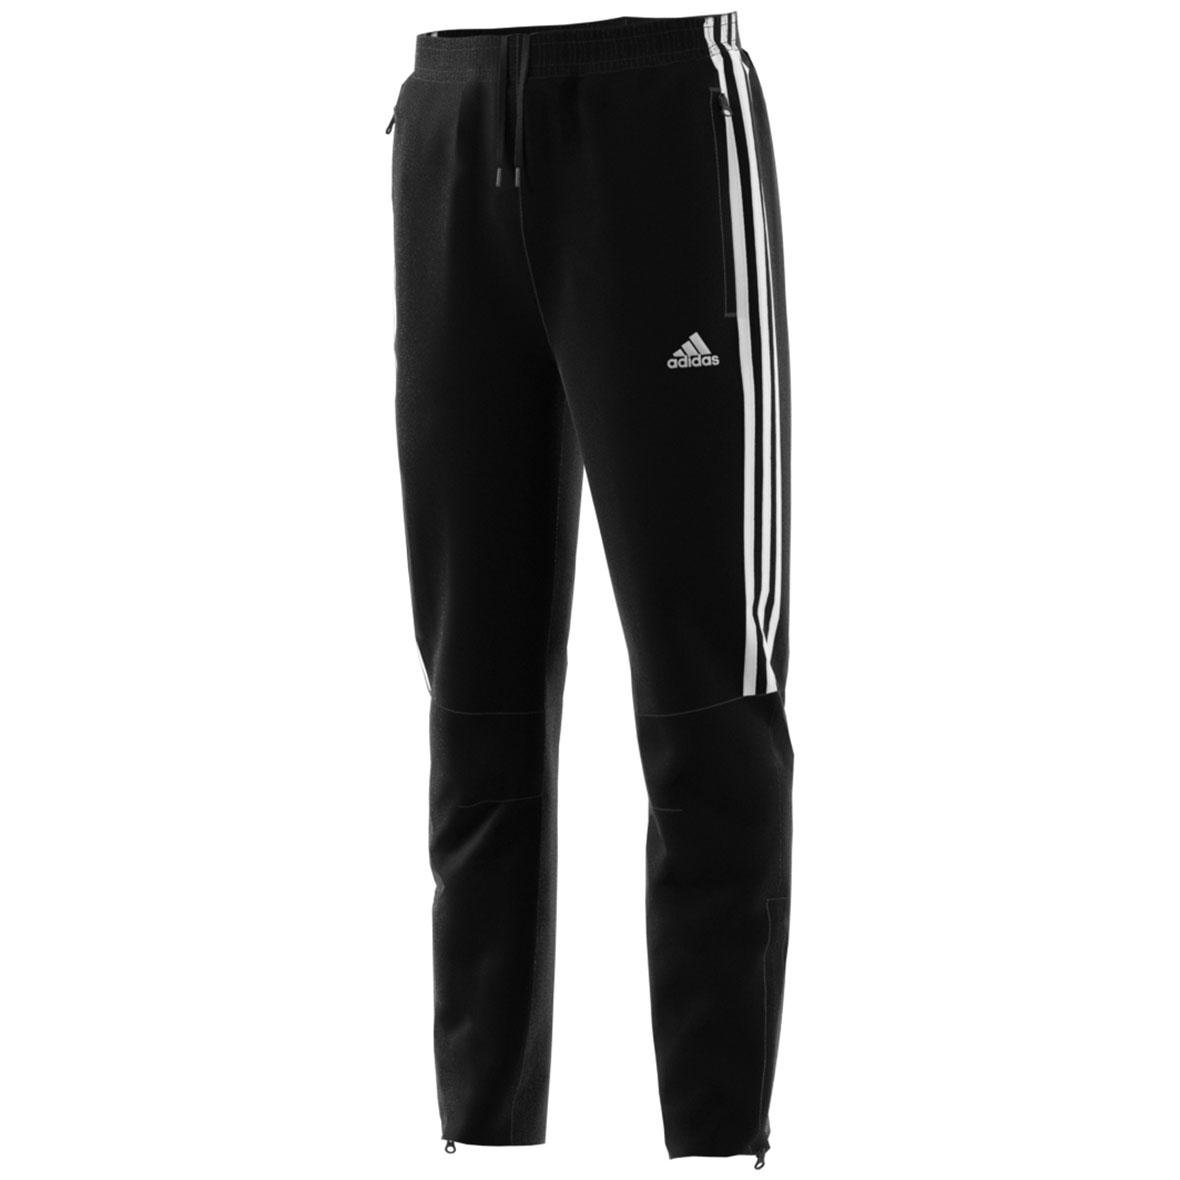 jerarquía Susurro tal vez  Junior Boys' [8-16] Tiro 3-Stripes Pant   adidas   Sporting Life ...